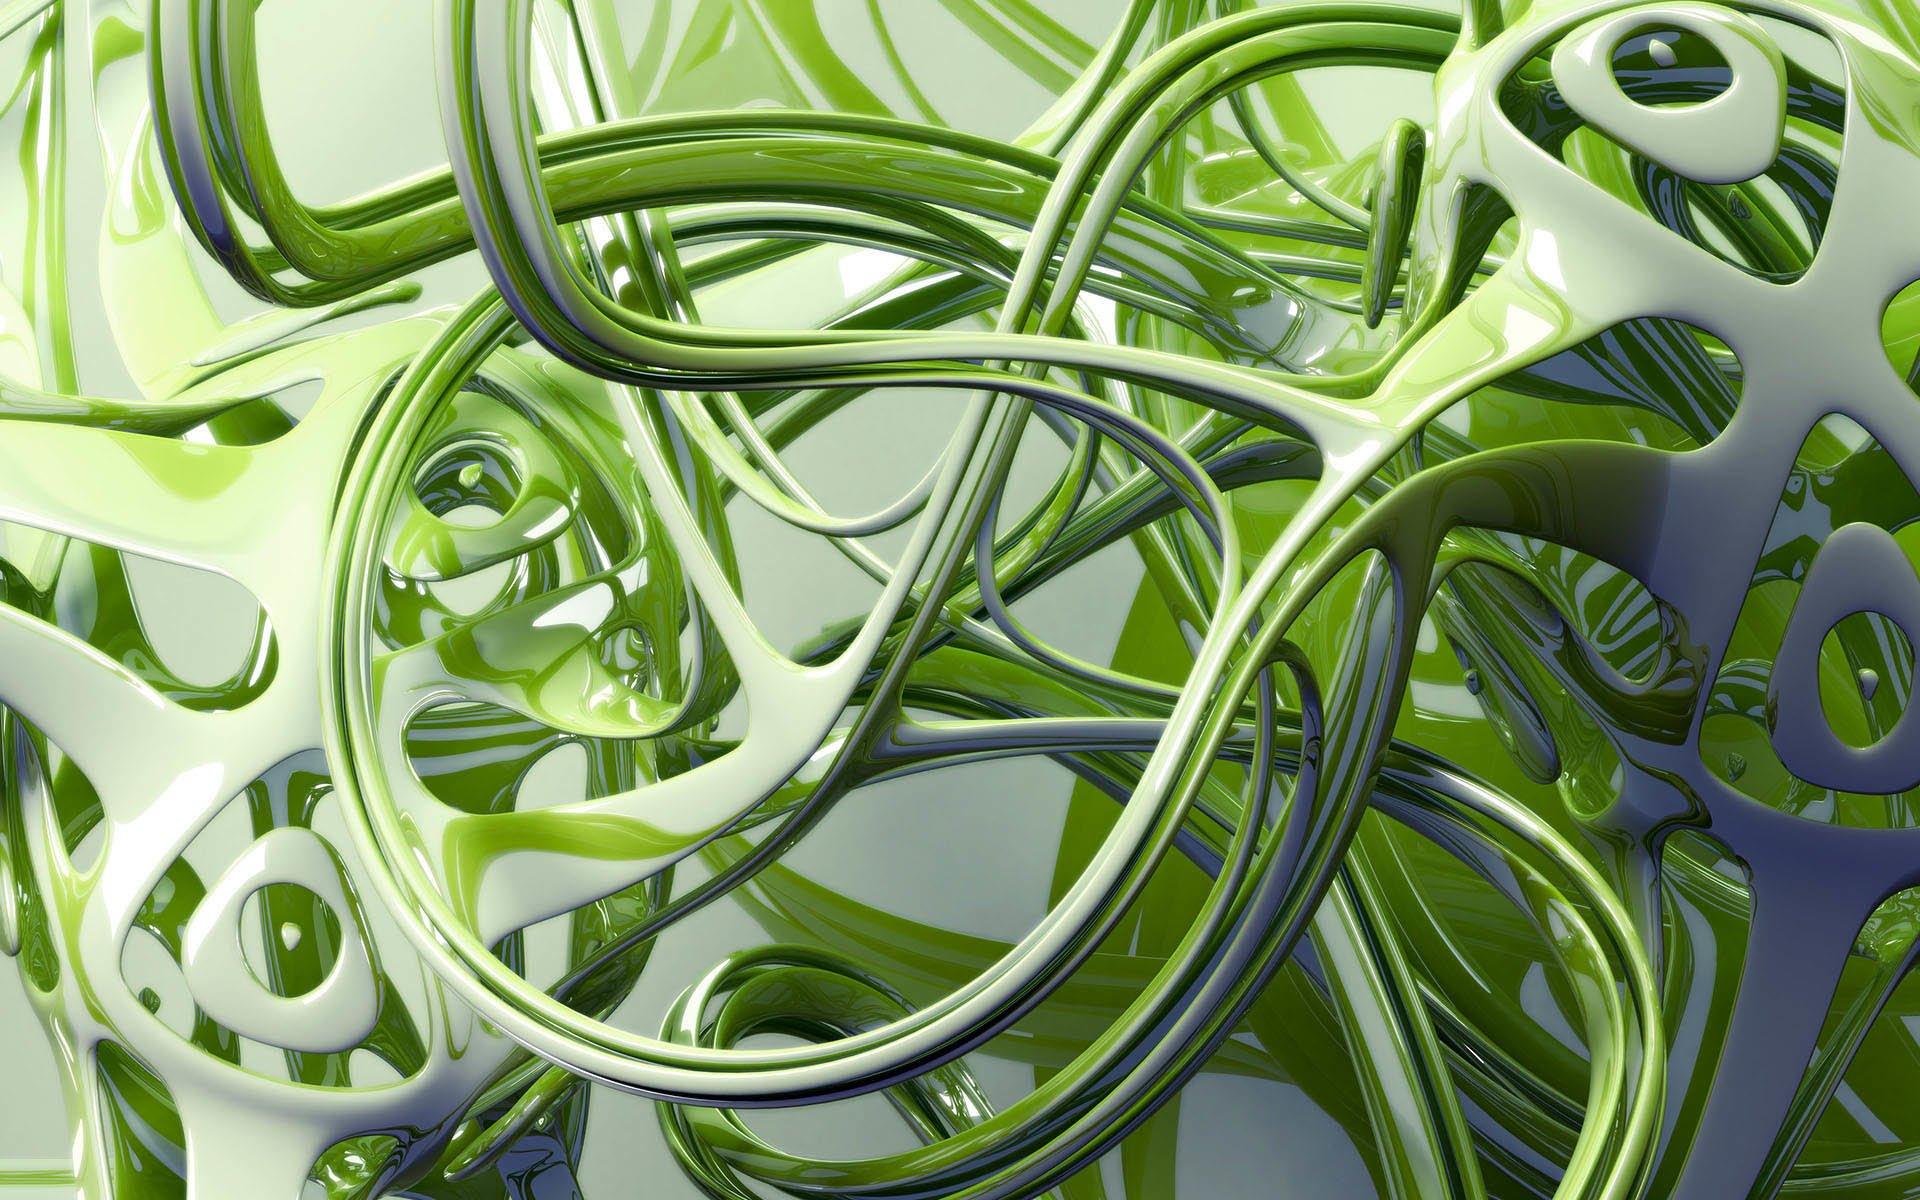 CGI - Abstract  3D Digital Art CGI Wallpaper